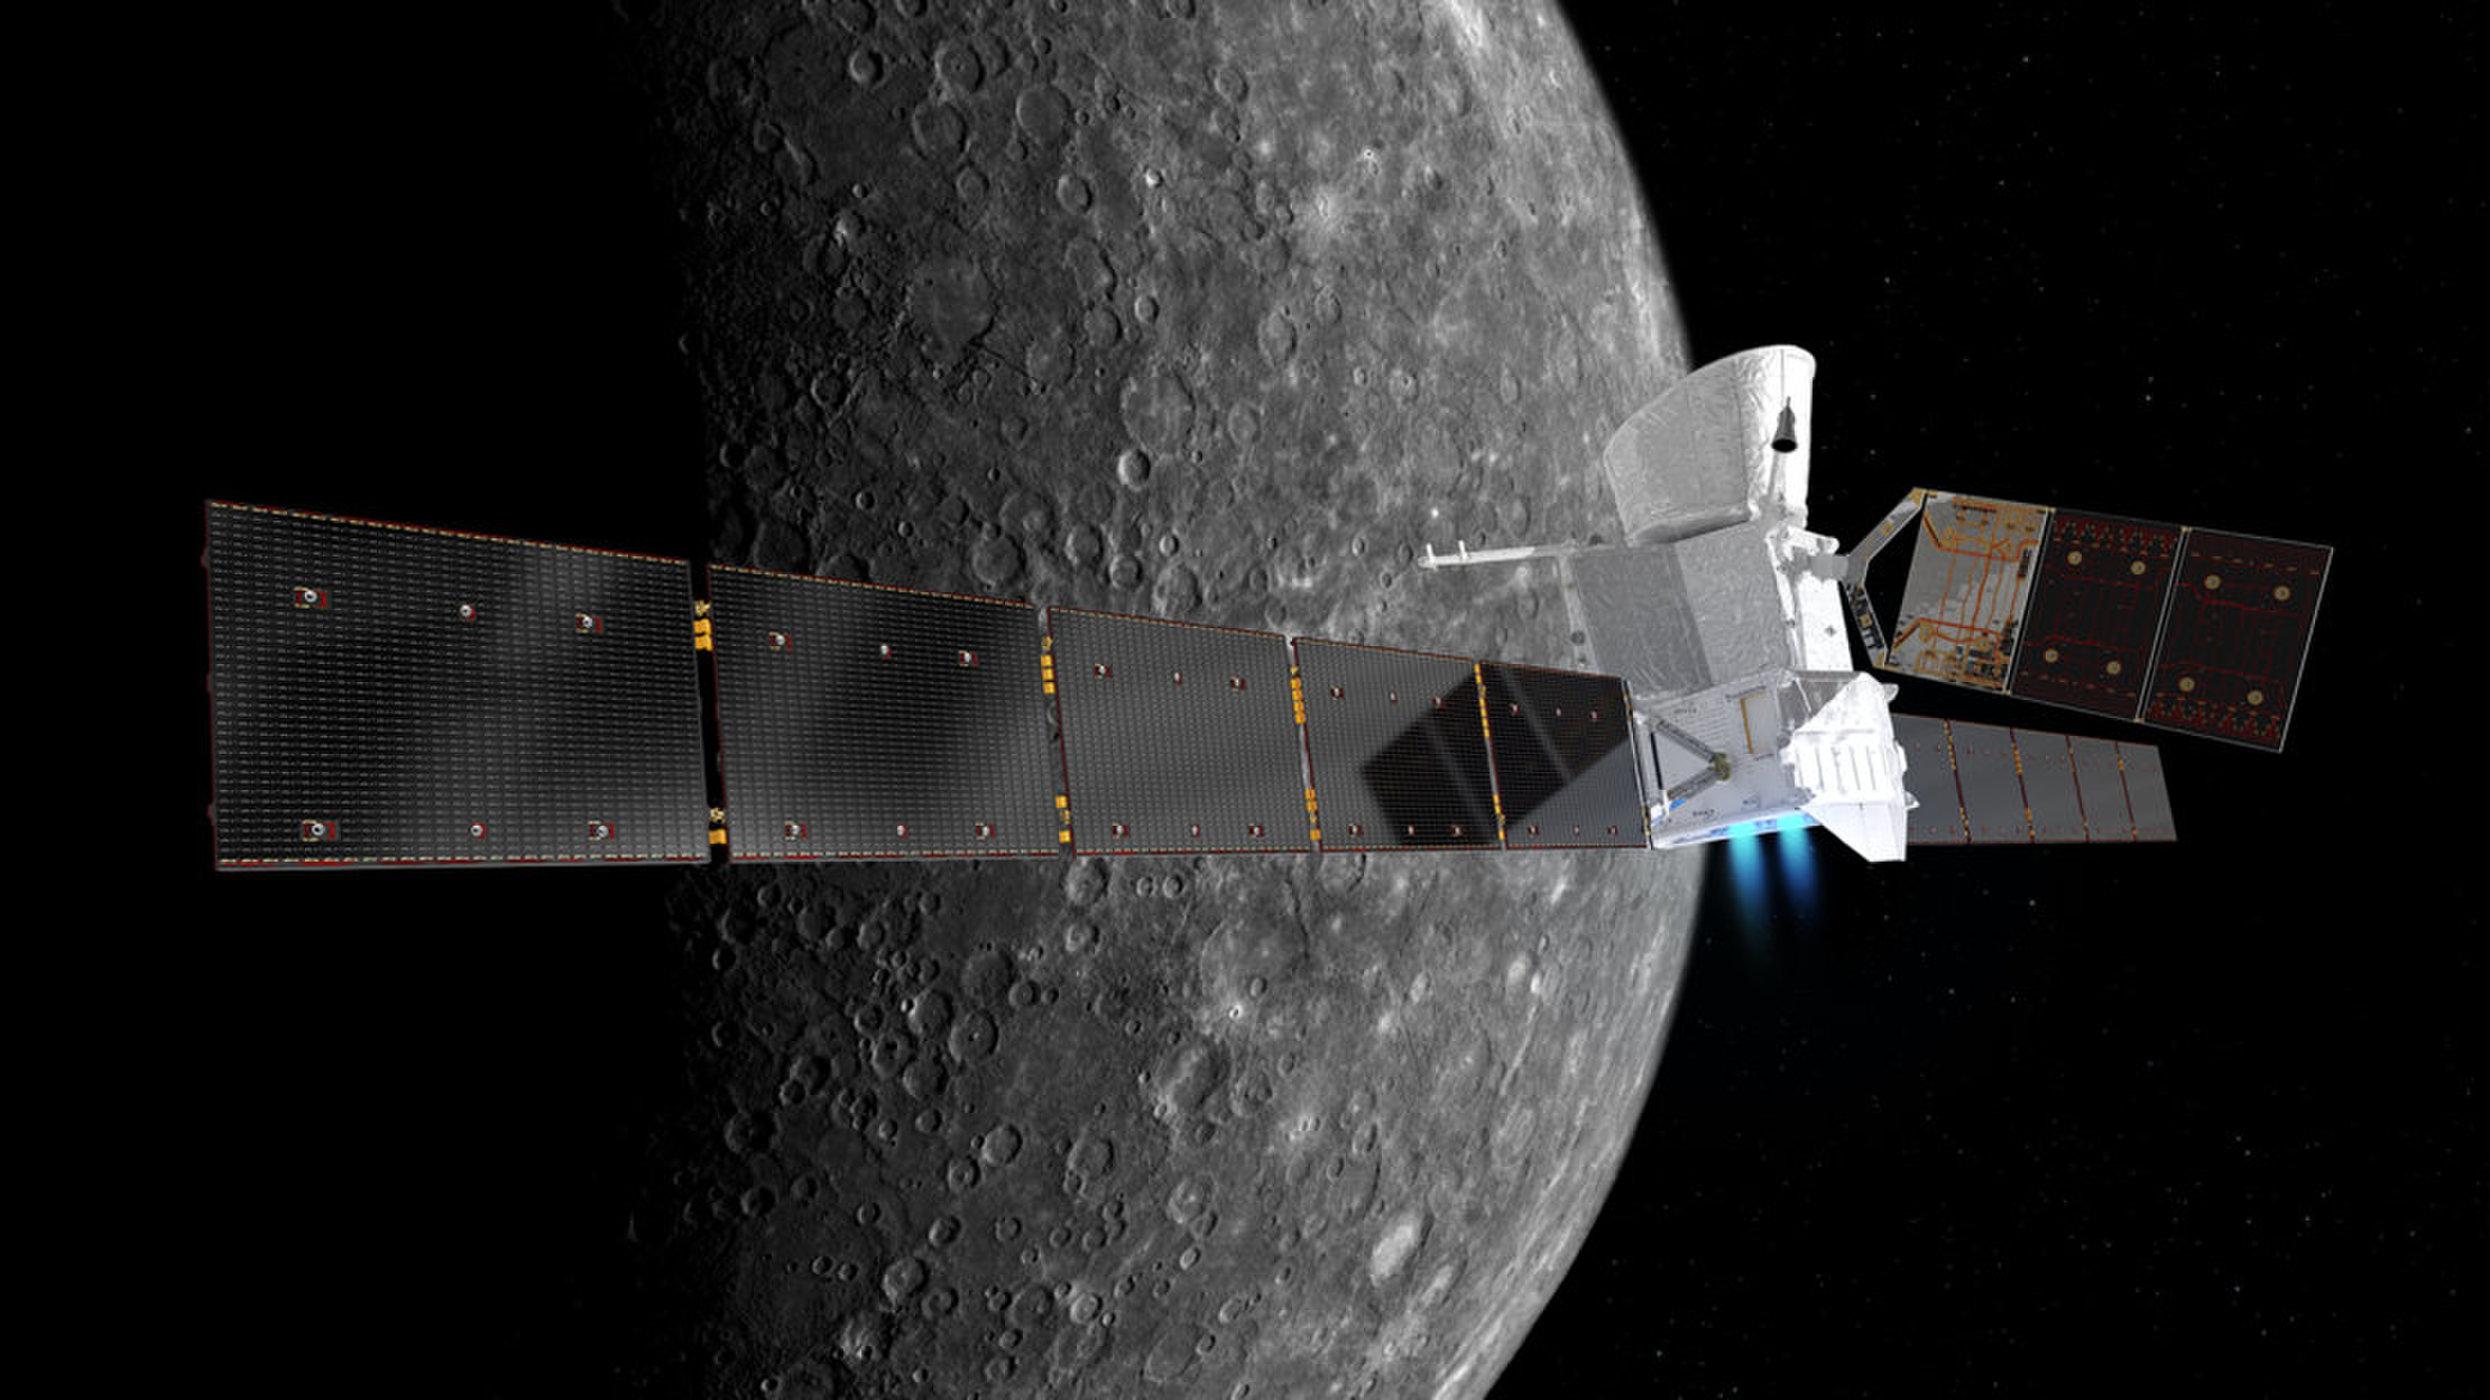 messenger spacecraft discoveries - 980×620